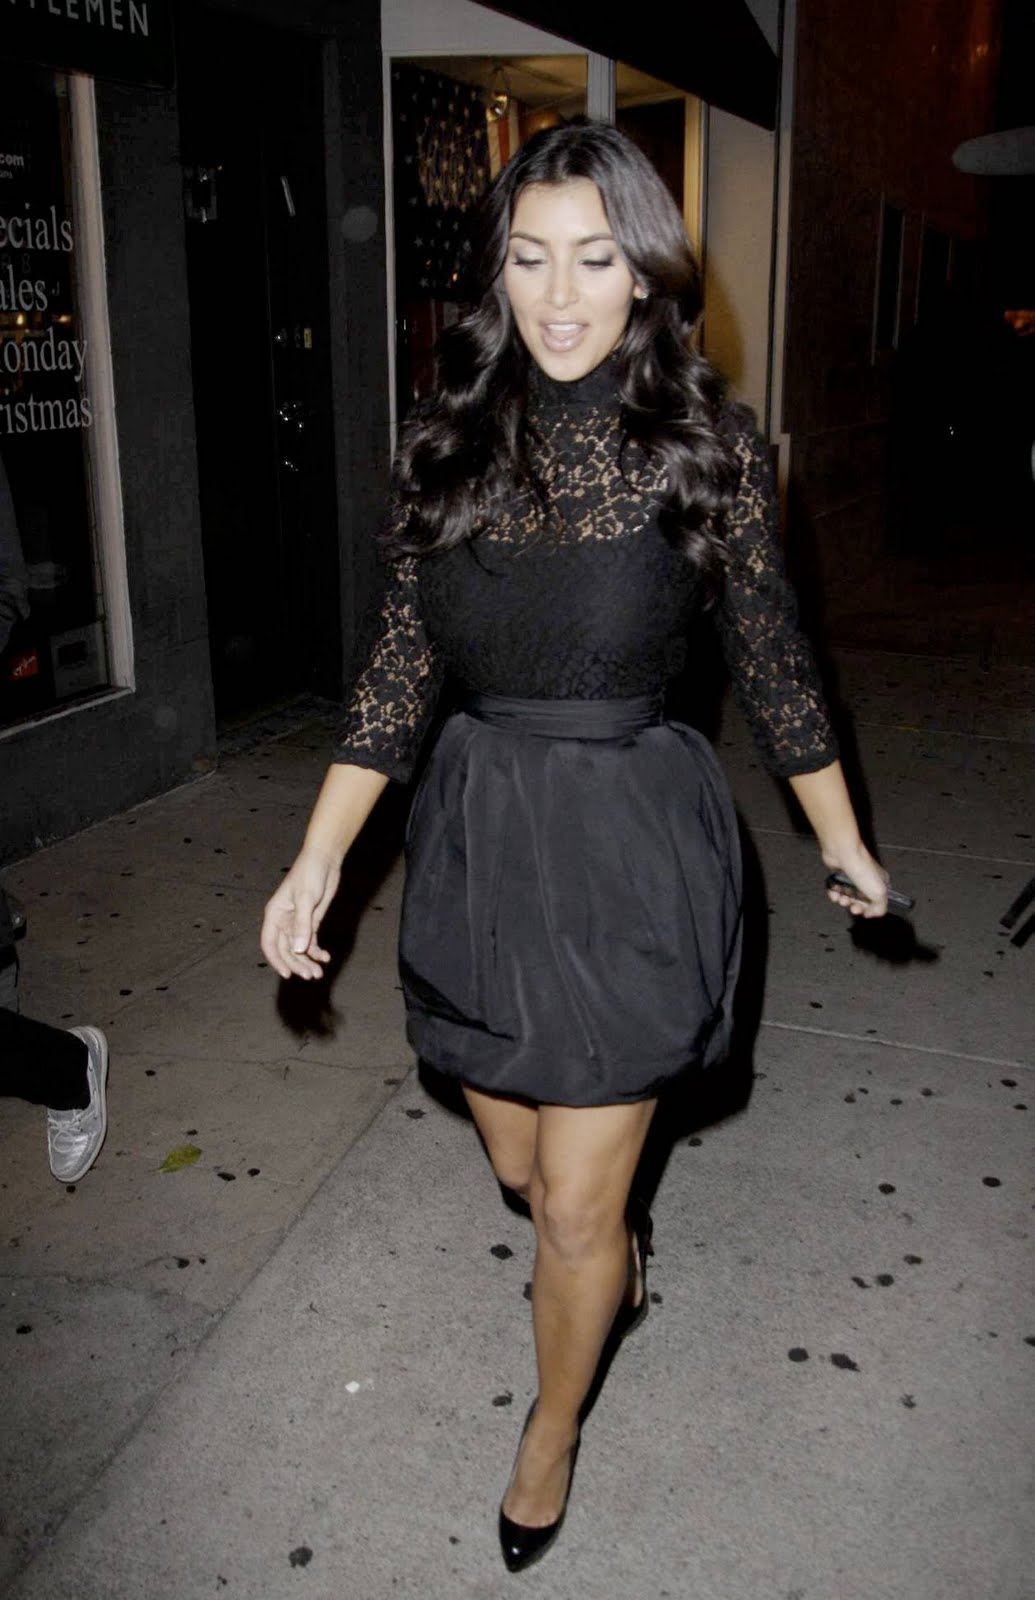 http://1.bp.blogspot.com/__dSMljhXGag/TBPQFk2BR1I/AAAAAAAAC4M/eThP9AyxgdE/s1600/05411_Kim_Kardashian_at_Villa_nightclub_in_Los_Angeles-9_122_936lo.jpg